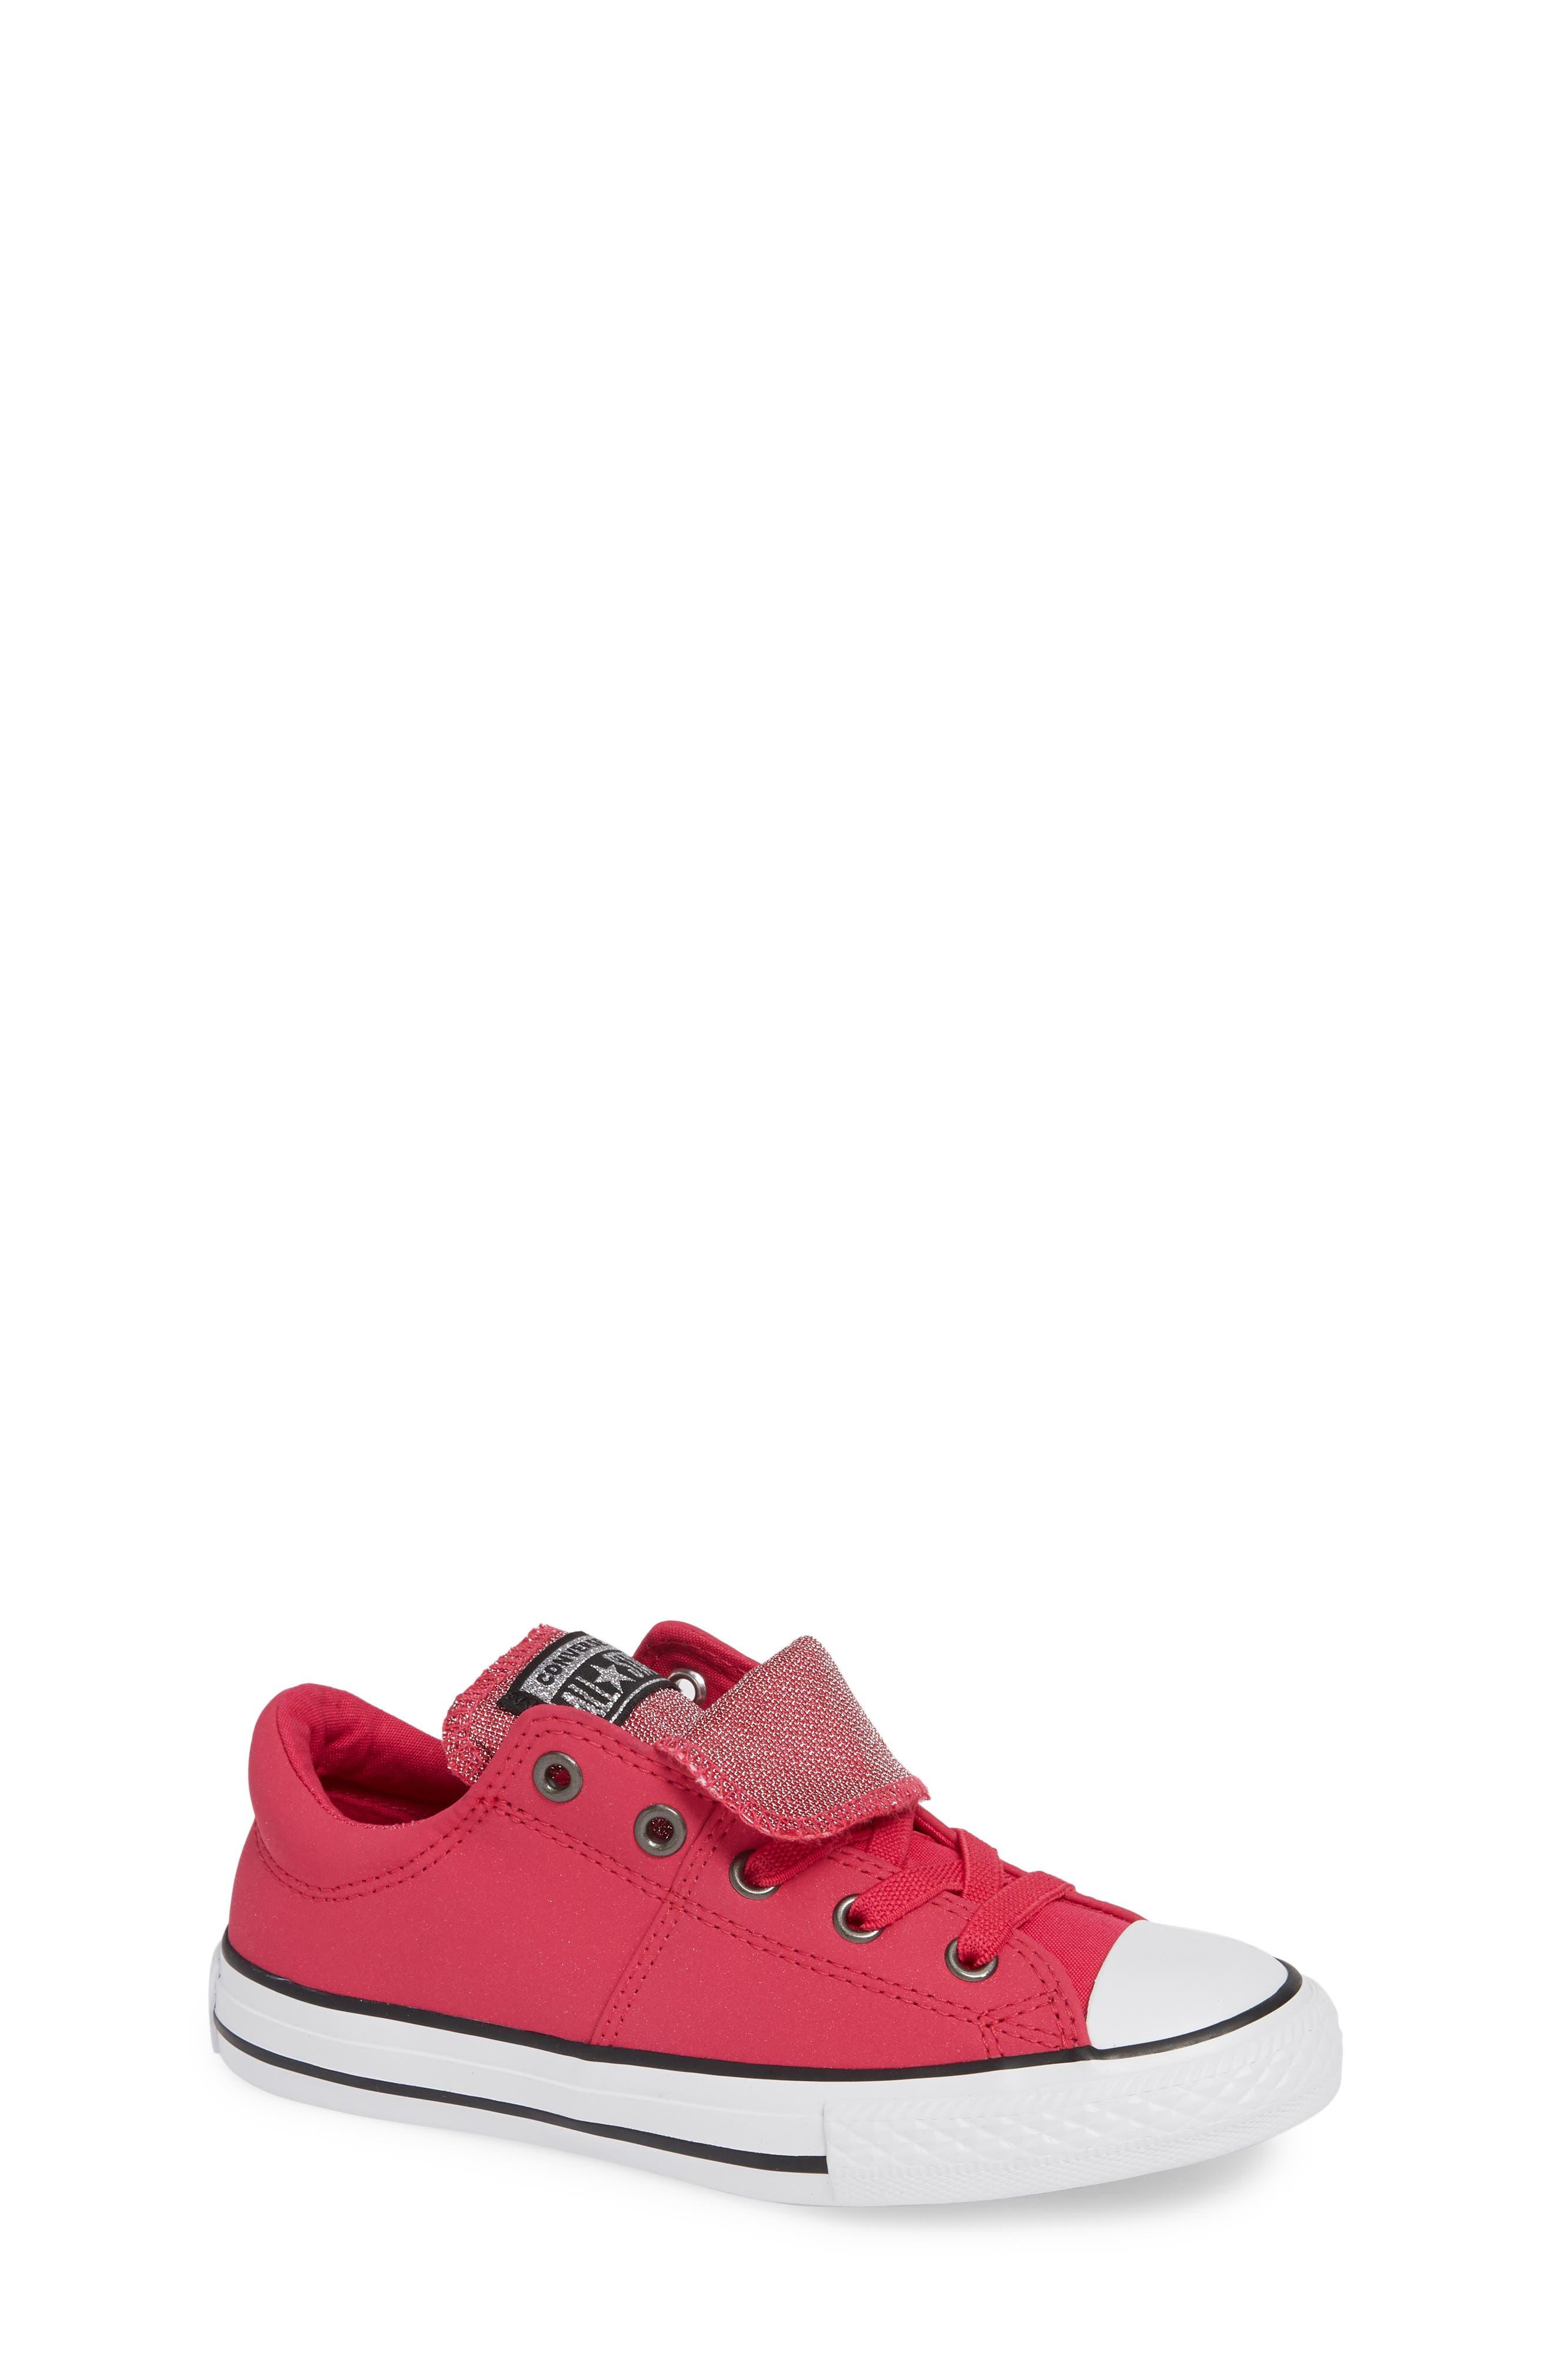 Girls Converse Chuck Taylor All Star Glitter Low Top Sneaker Size 125 M  Pink